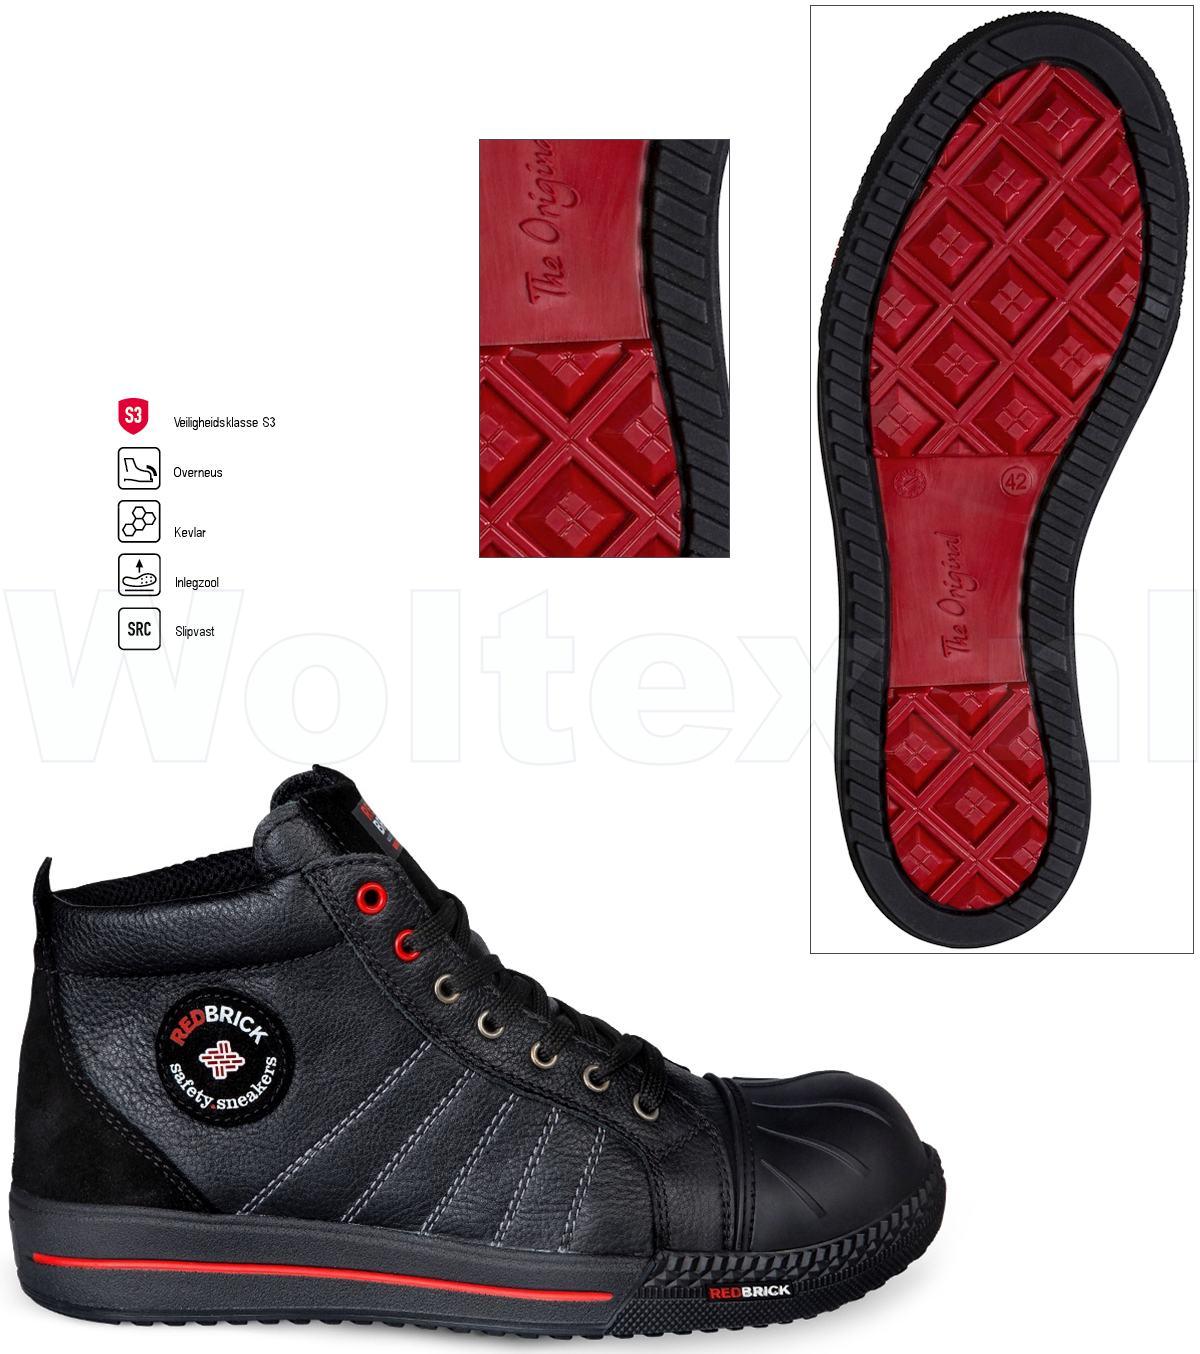 Werkschoenen 36.Redbrick Safety Sneakers Originals S3 Werkschoenen Onyx Overneus